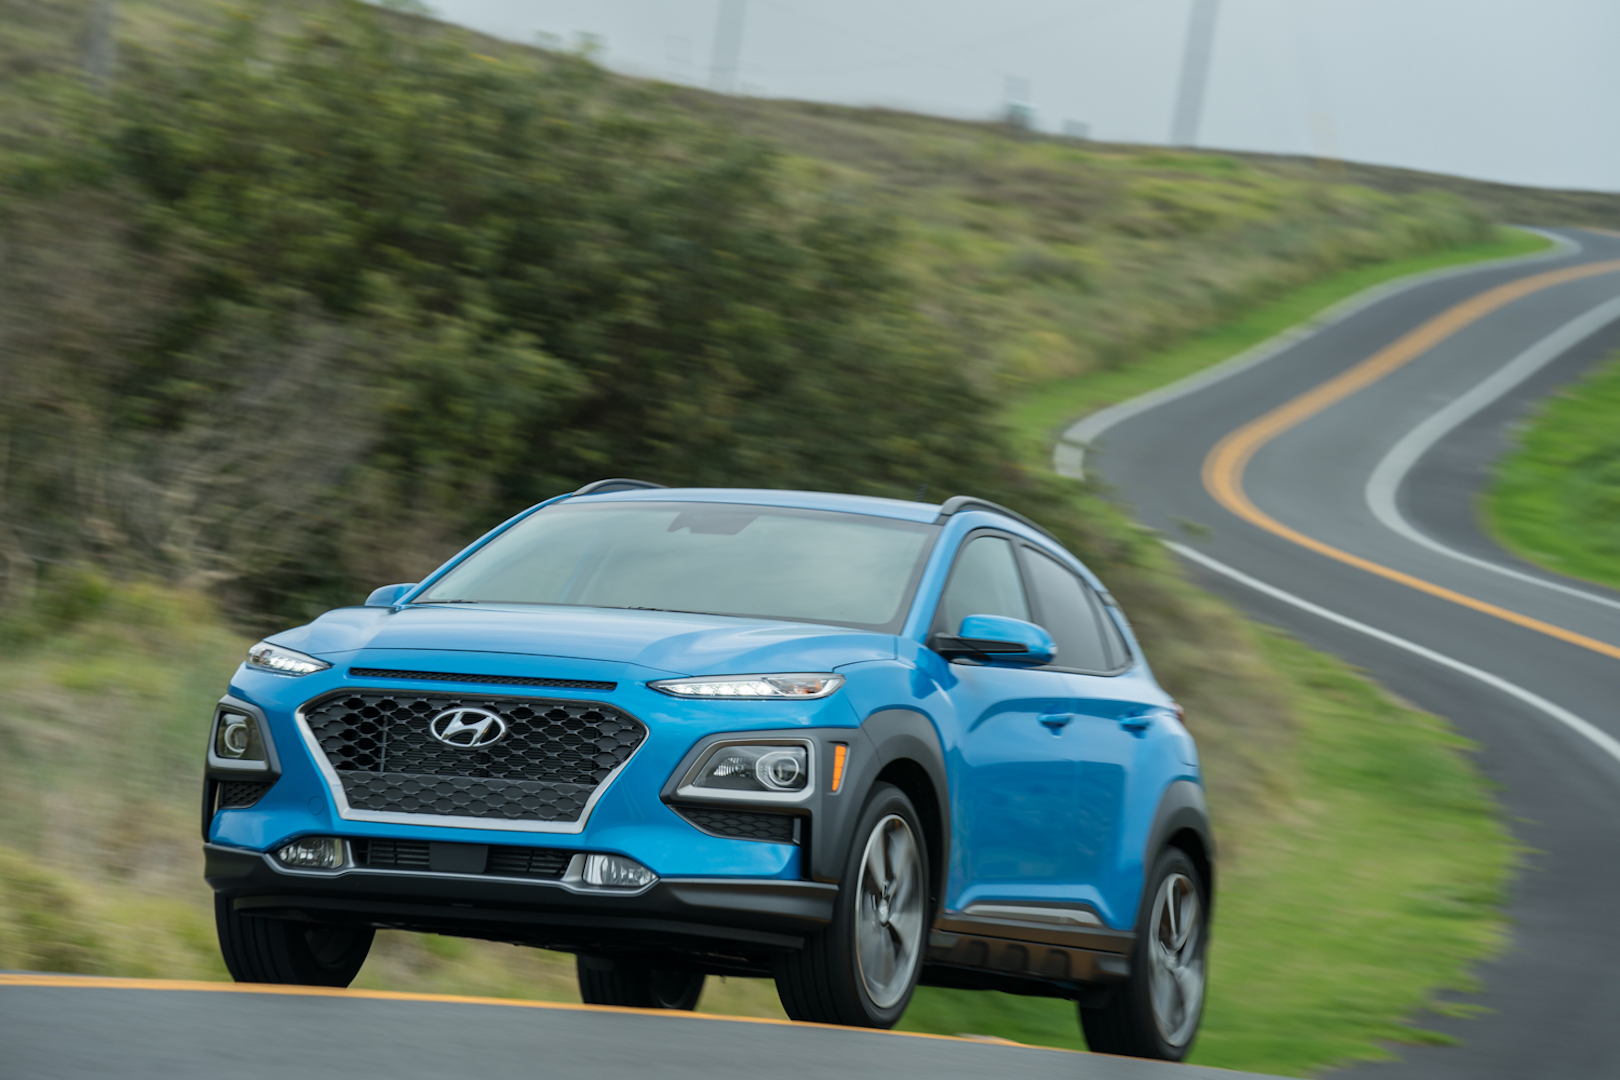 Hyundai Dealers In Ct >> Flipboard: 2019 Hyundai Kona Review, Ratings, Specs, Prices, and Photos